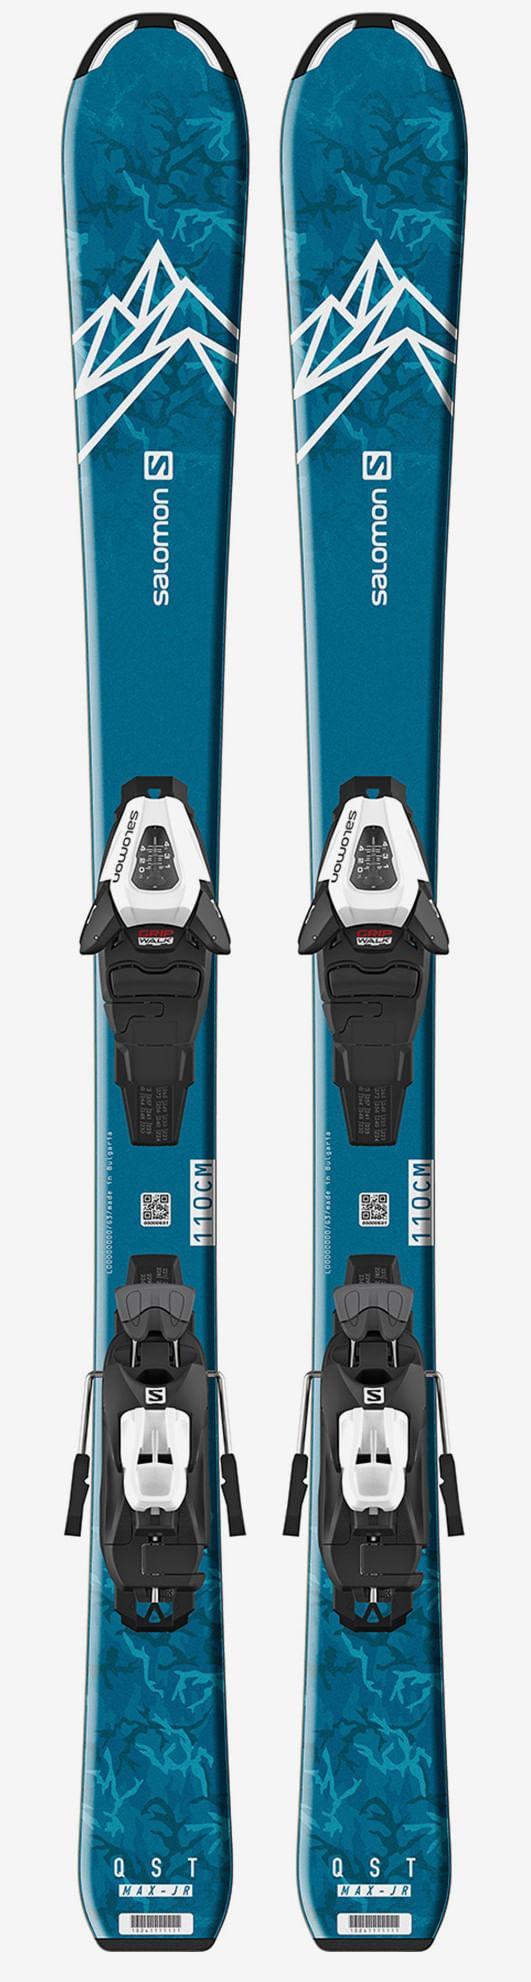 Salomon-QST-Max-Jr.-S-Kids-Ski-With-C5-GW-Bindings-2021